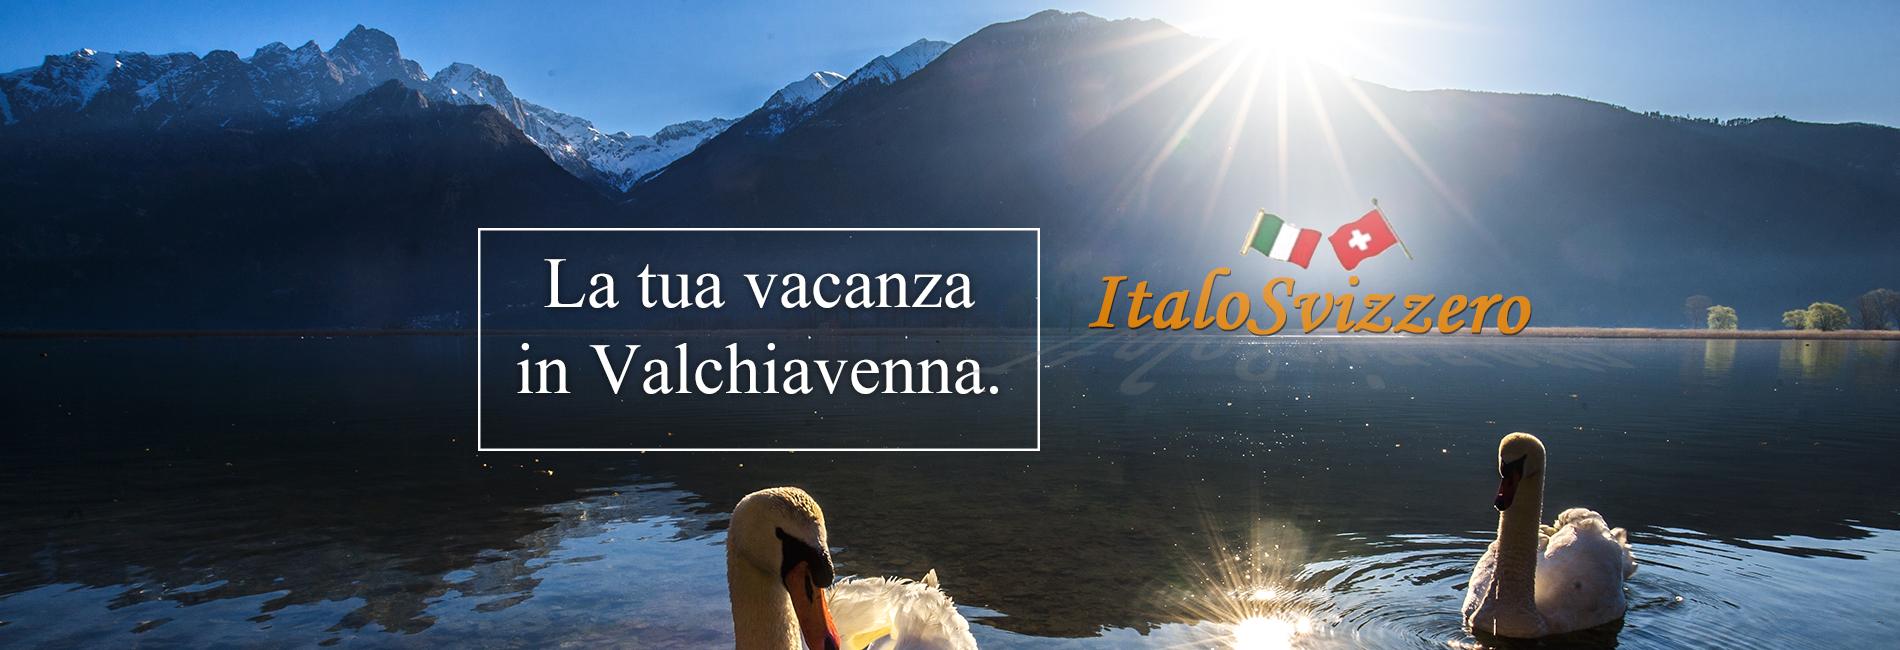 slide2-italosvizzero-lago